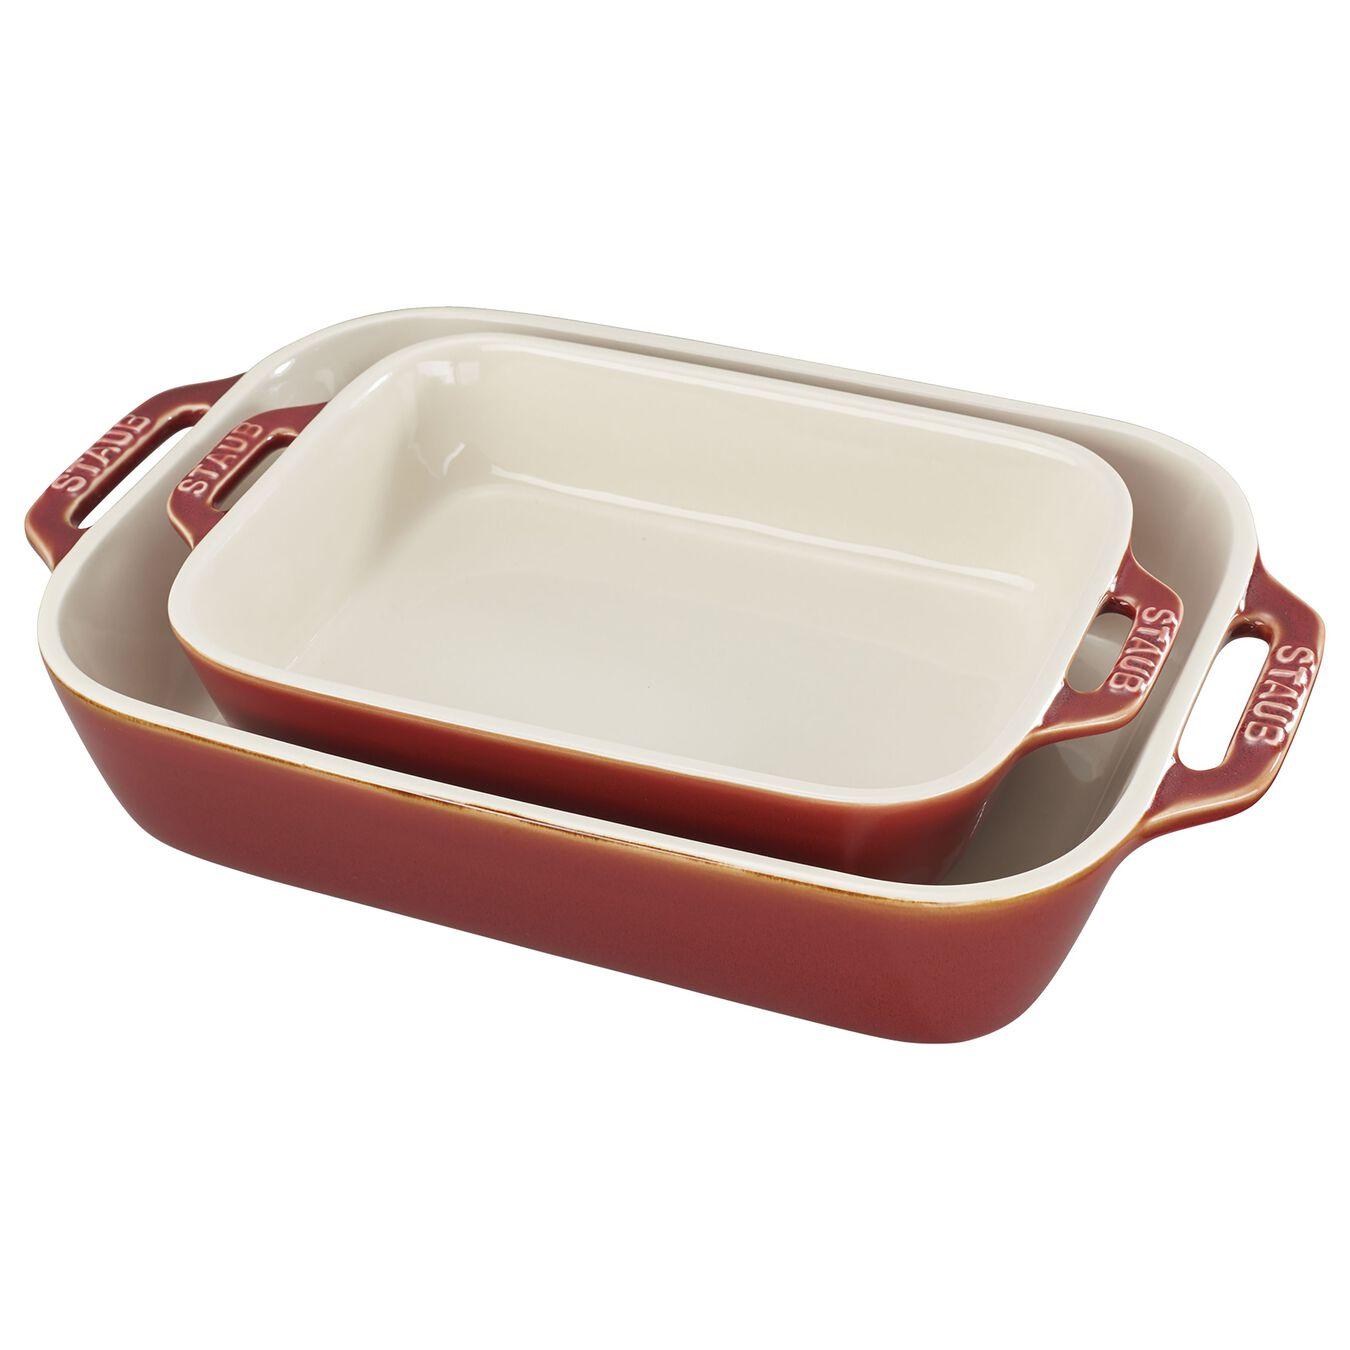 2 Piece rectangular Bakeware set, ancient-copper,,large 2